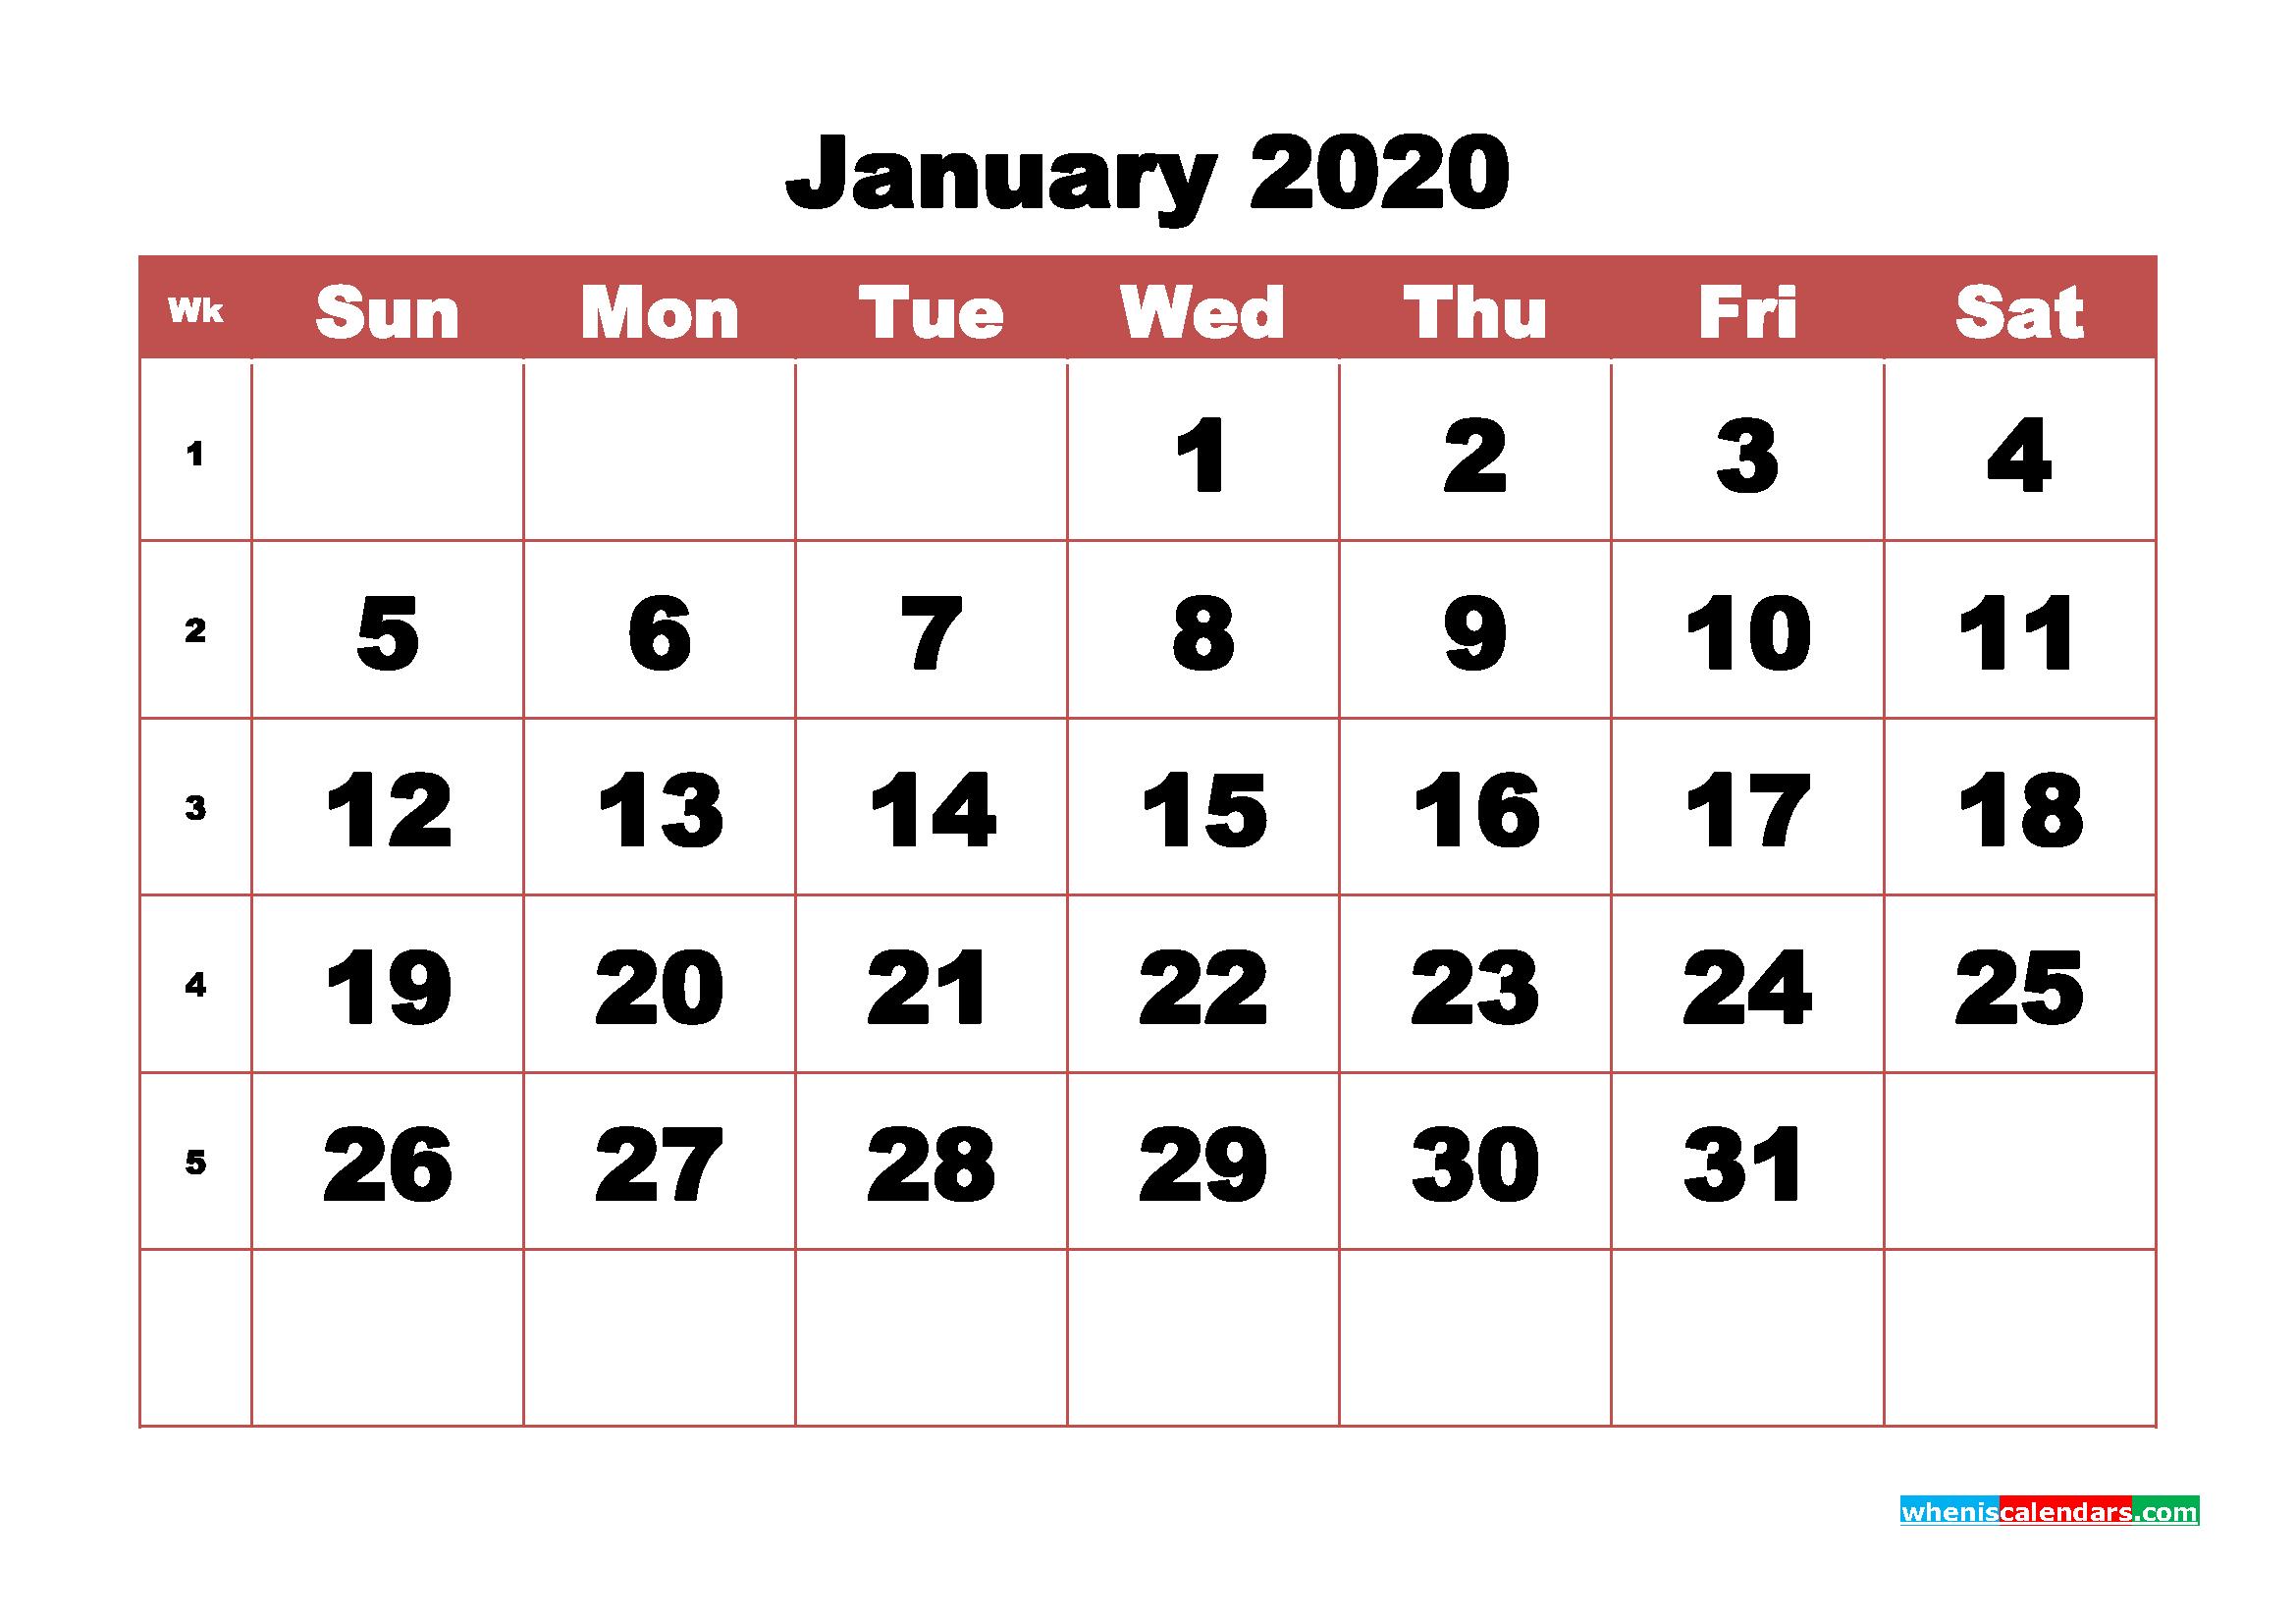 Blank January 2020 Calendar Printable - No.m20b337